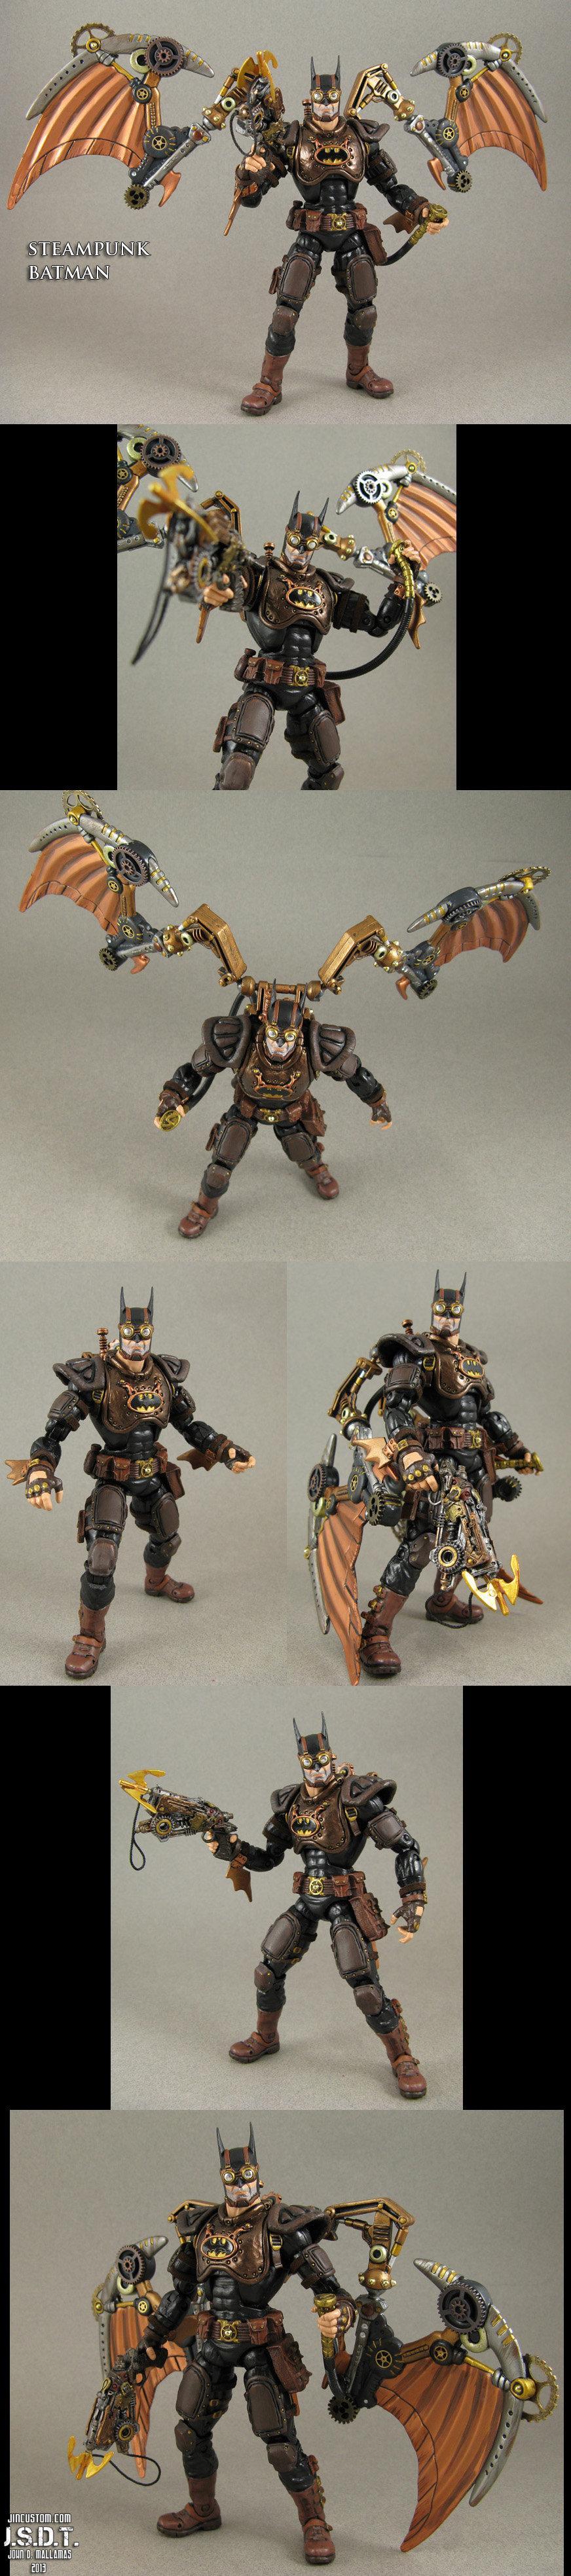 steampunk_batman_custom_action_figure_by_jin_saotome-d60x9zr_1365513407.jpg_872x3935